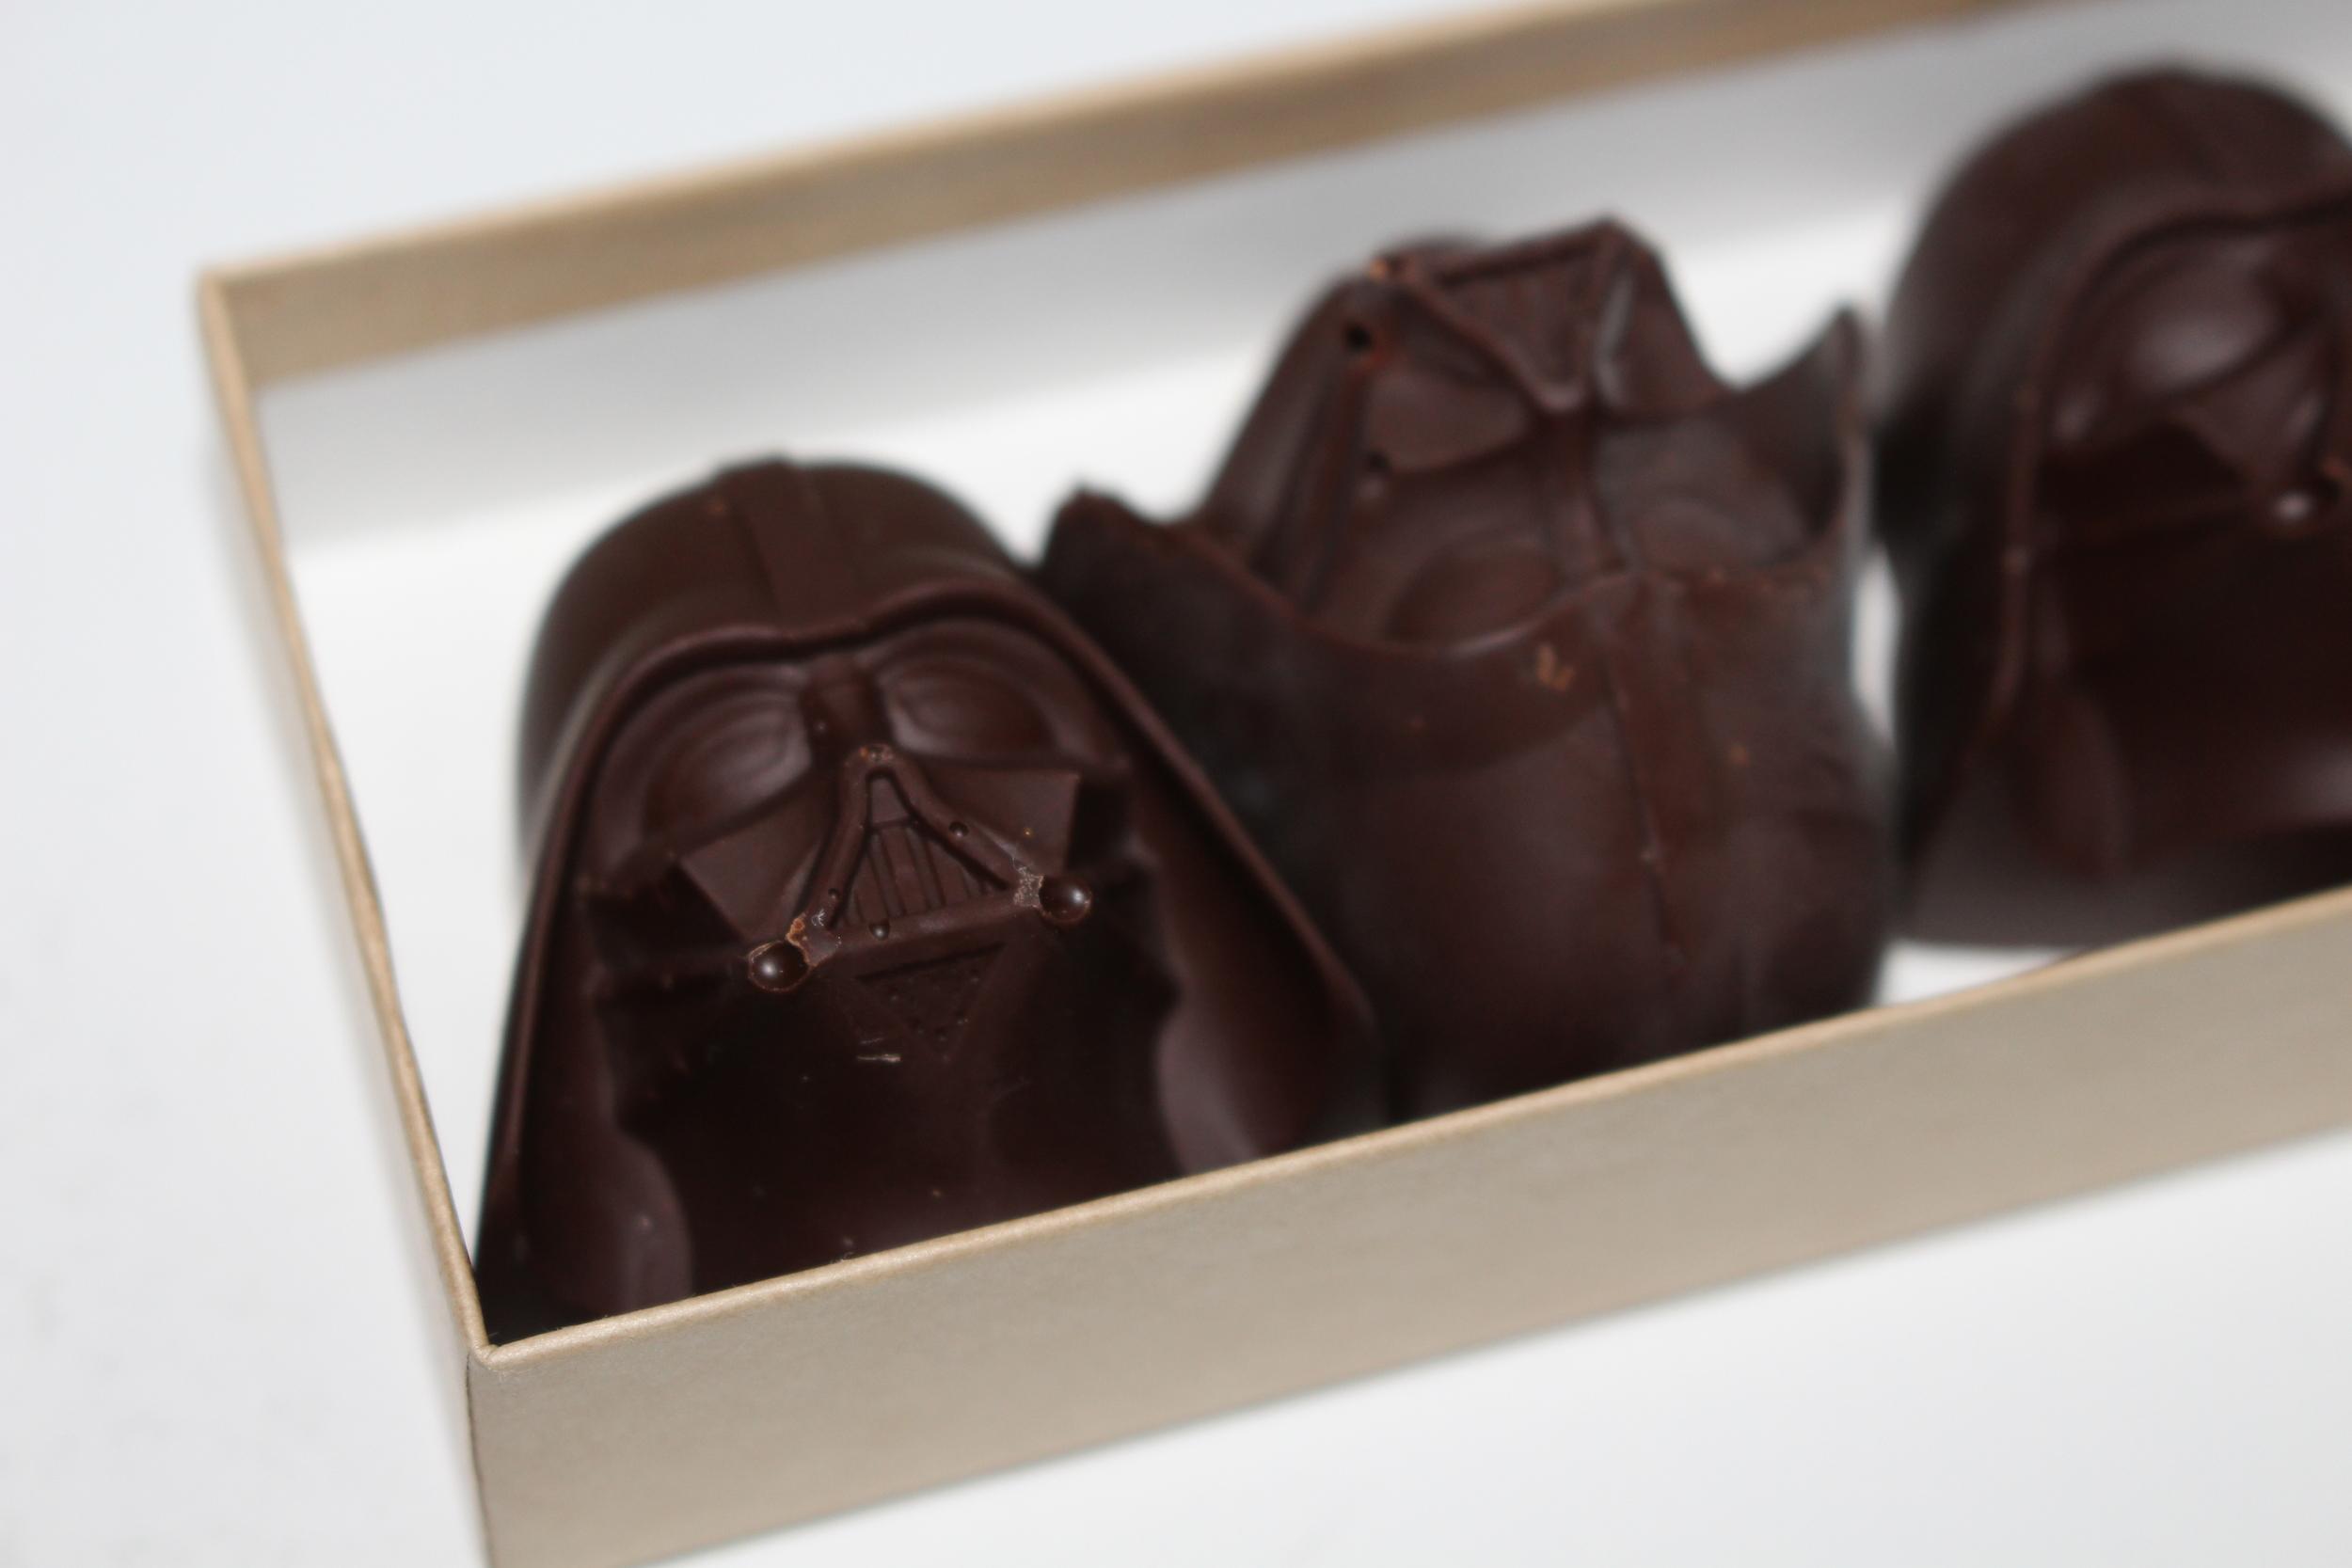 Chocolate Darth Vader Truffles